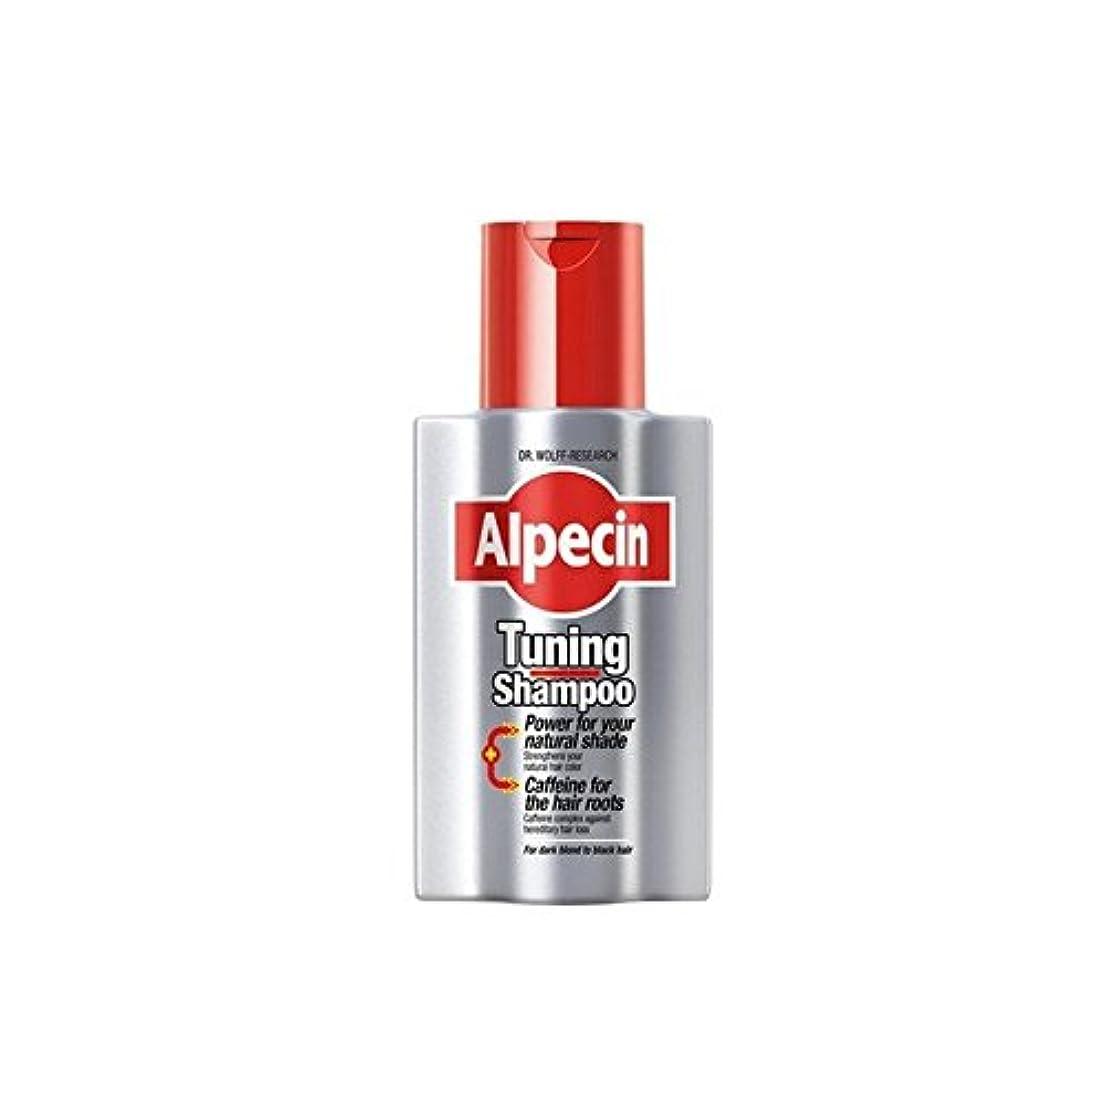 Alpecin Tuning Shampoo (200ml) - チューニングシャンプー(200ミリリットル) [並行輸入品]